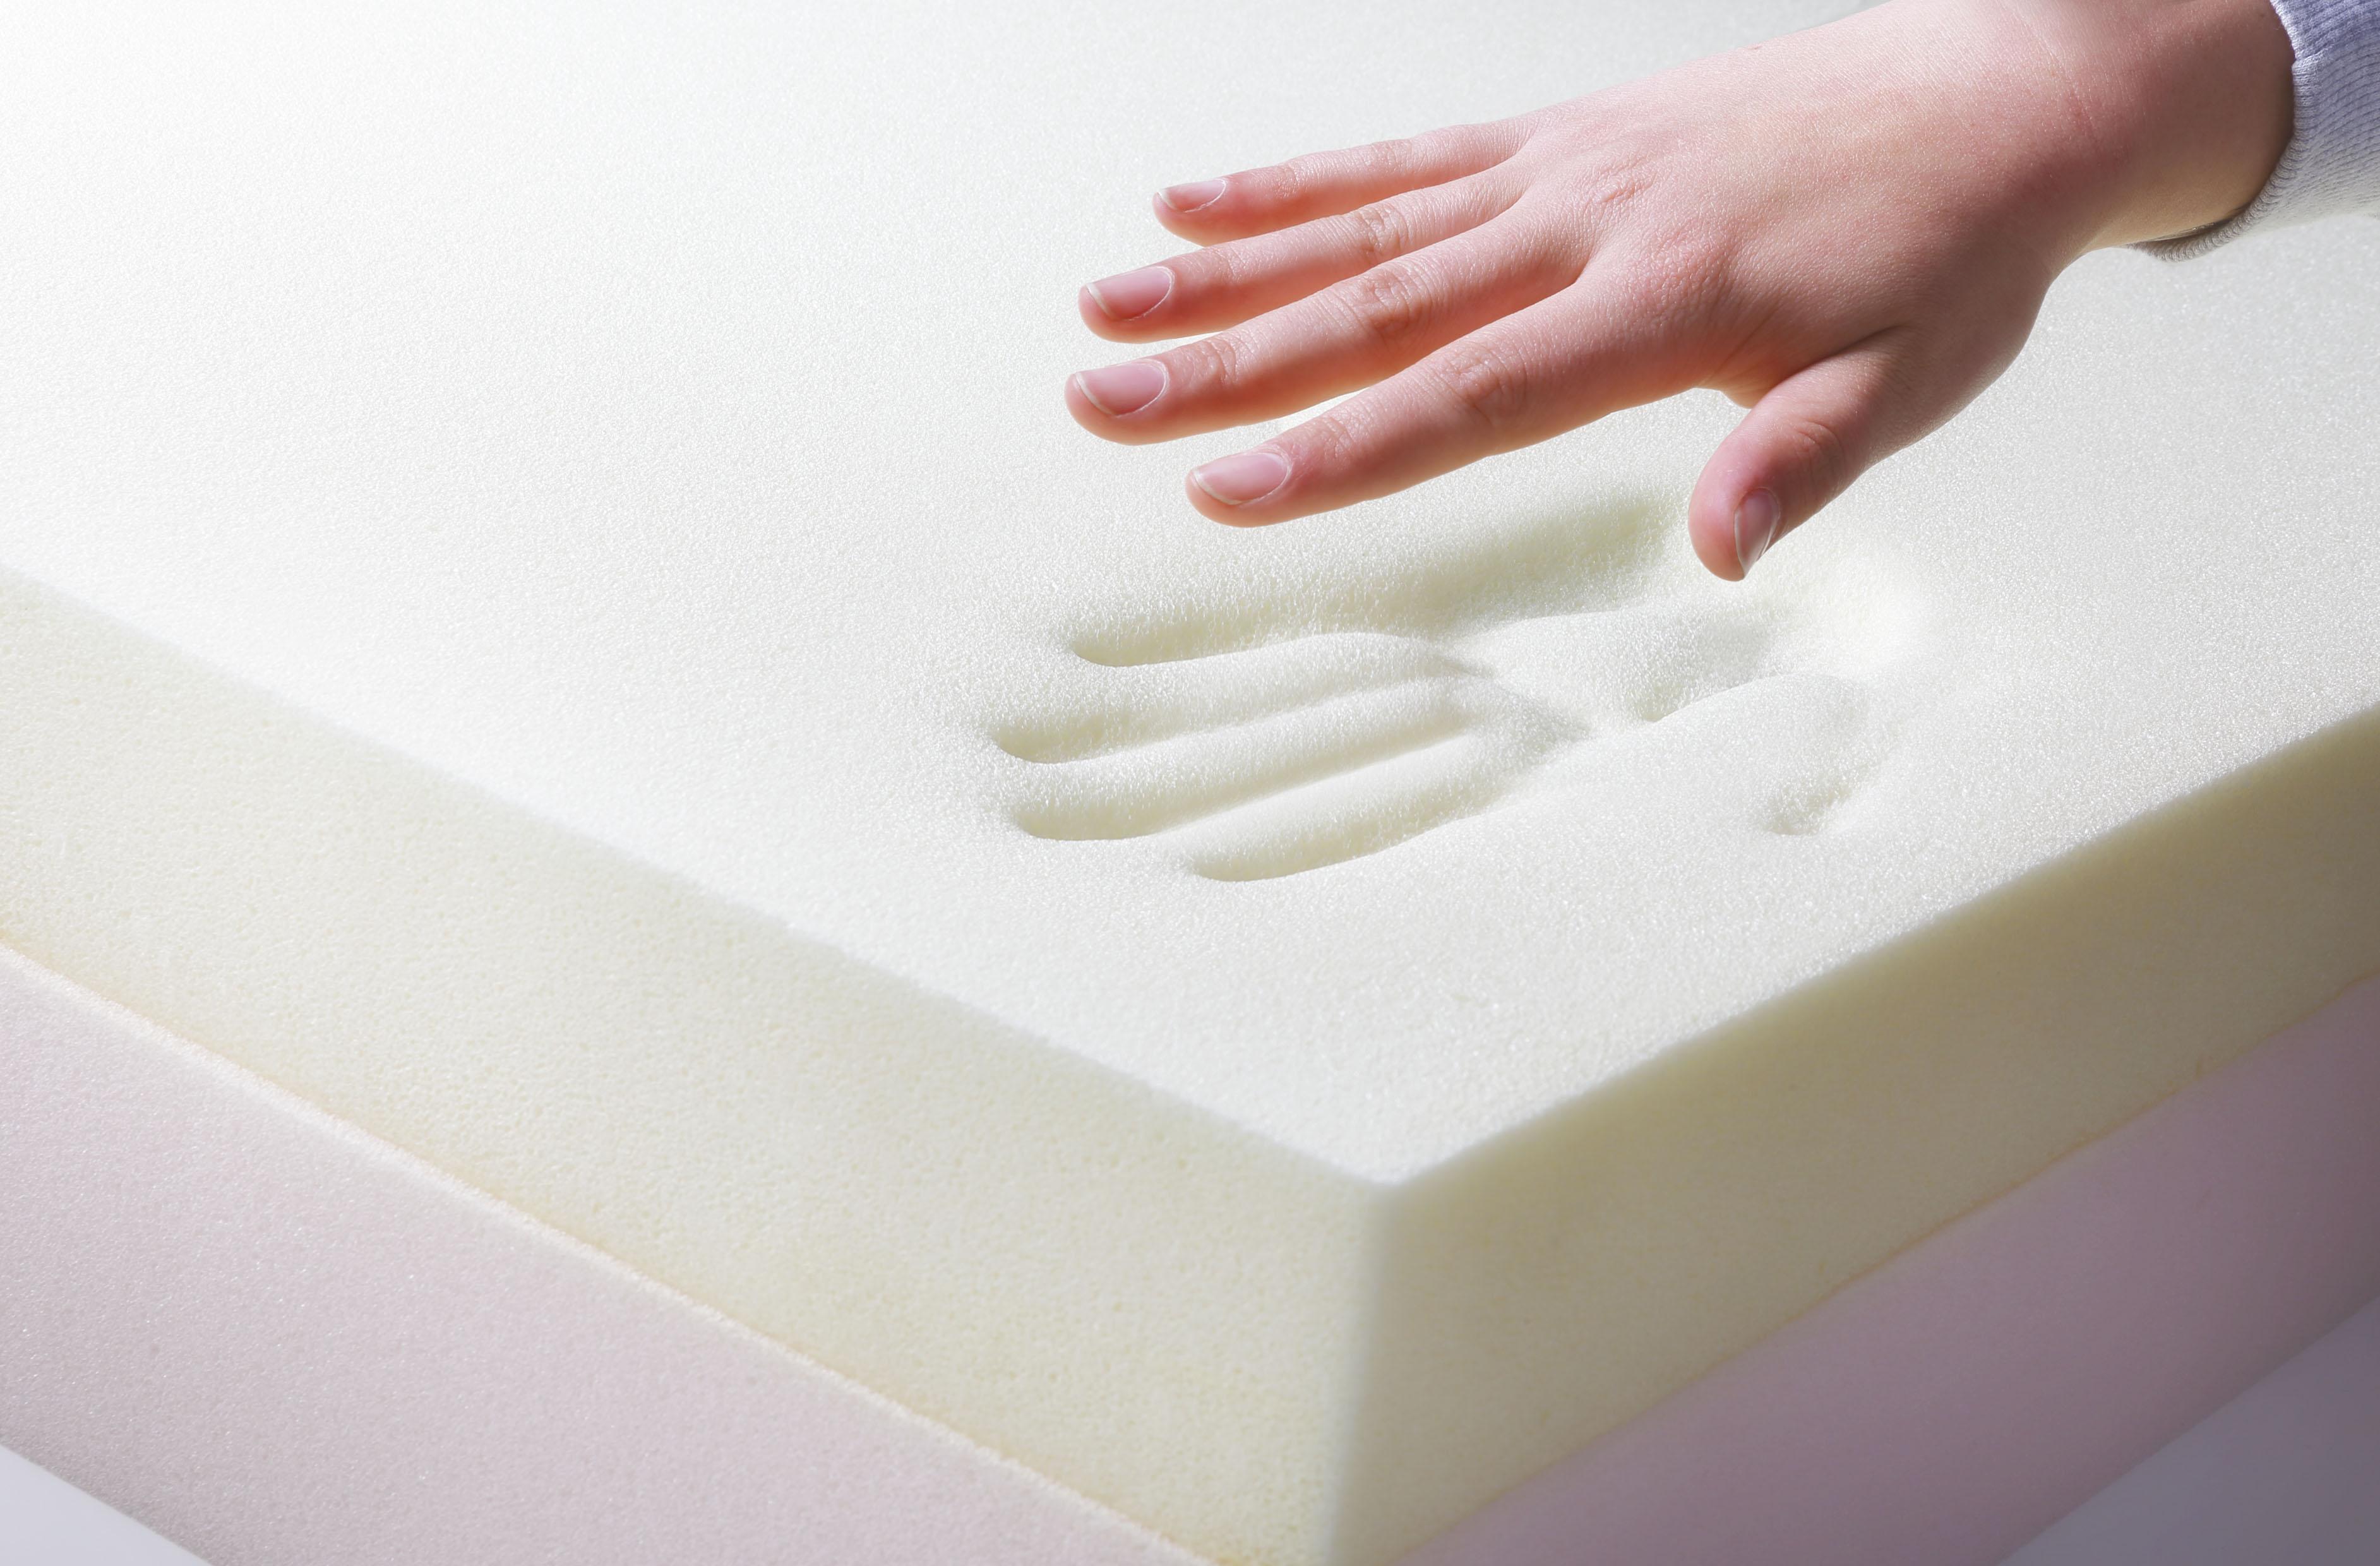 Matras Vacuum Verpakken : Incontinentie matras koudschuim medium incontinentie matras